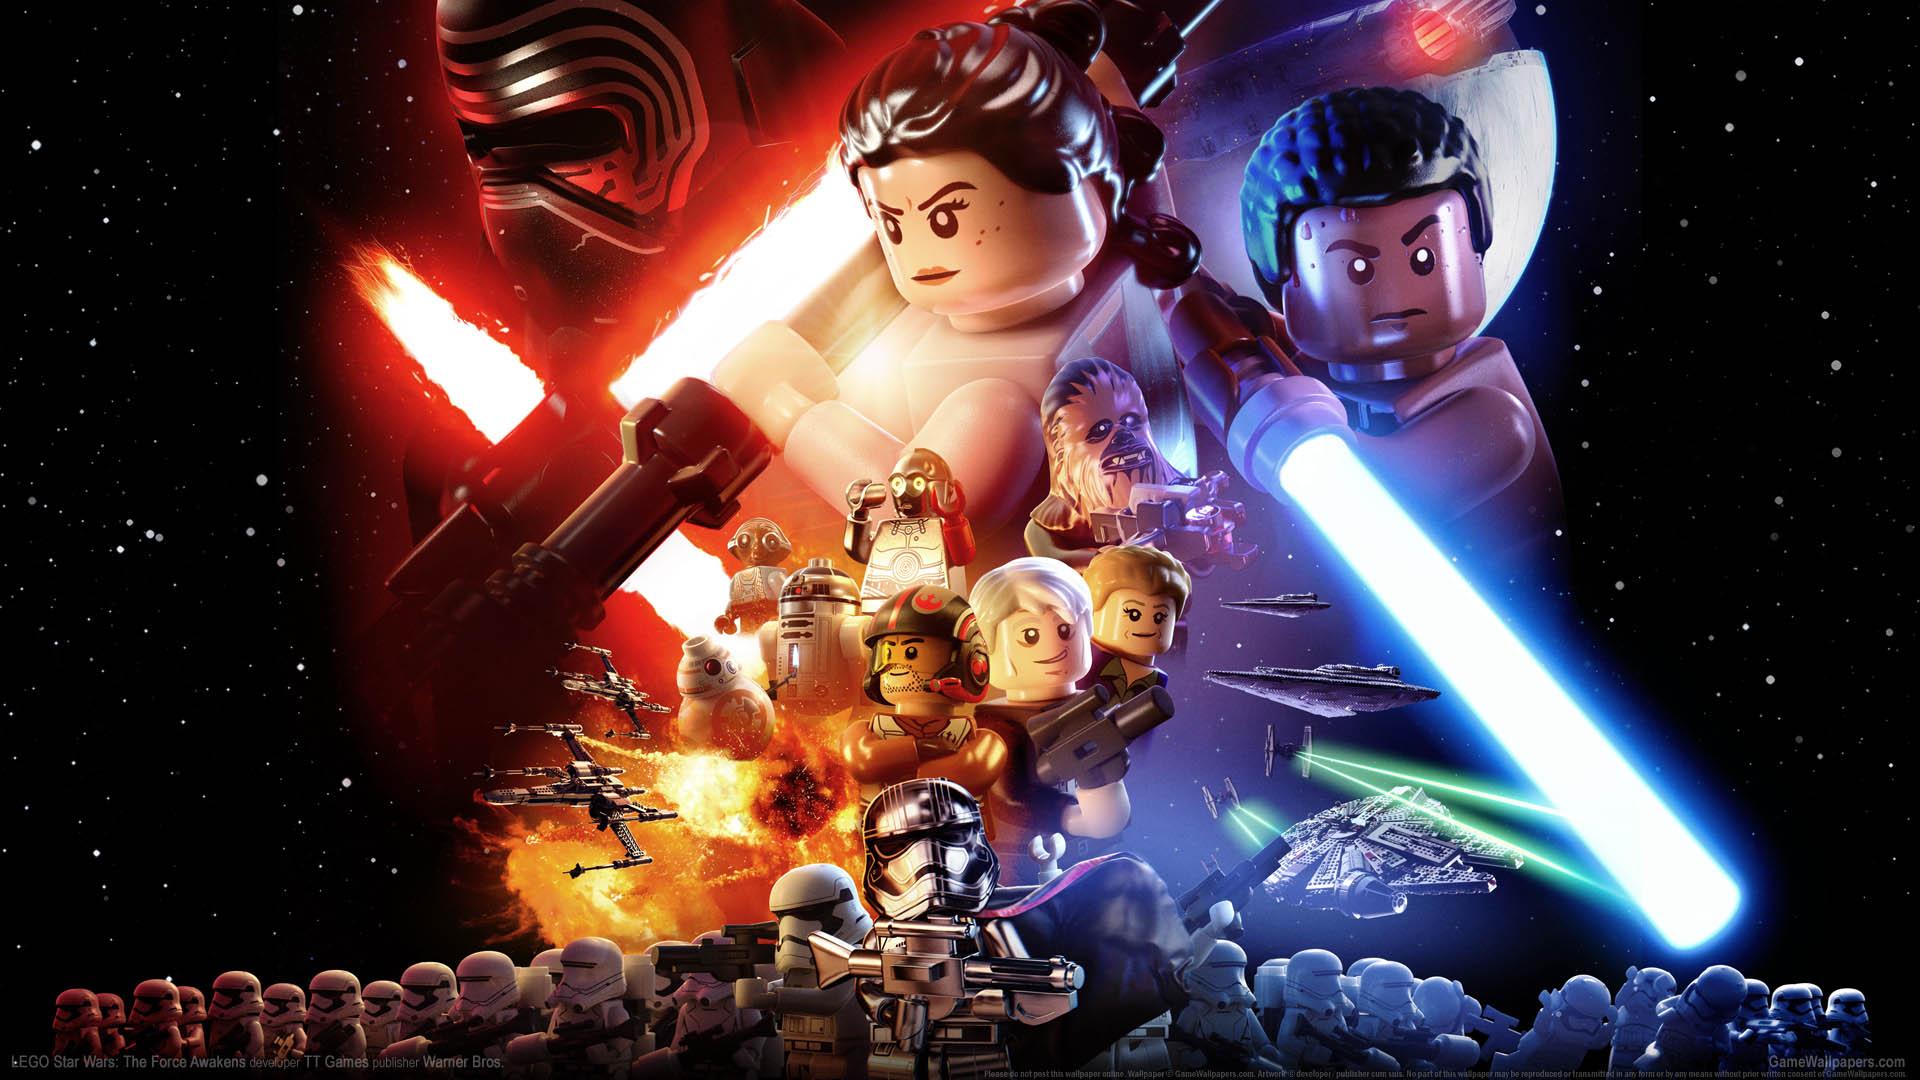 Lego Star Wars The Force Awakens Wallpaper 01 1920x1080